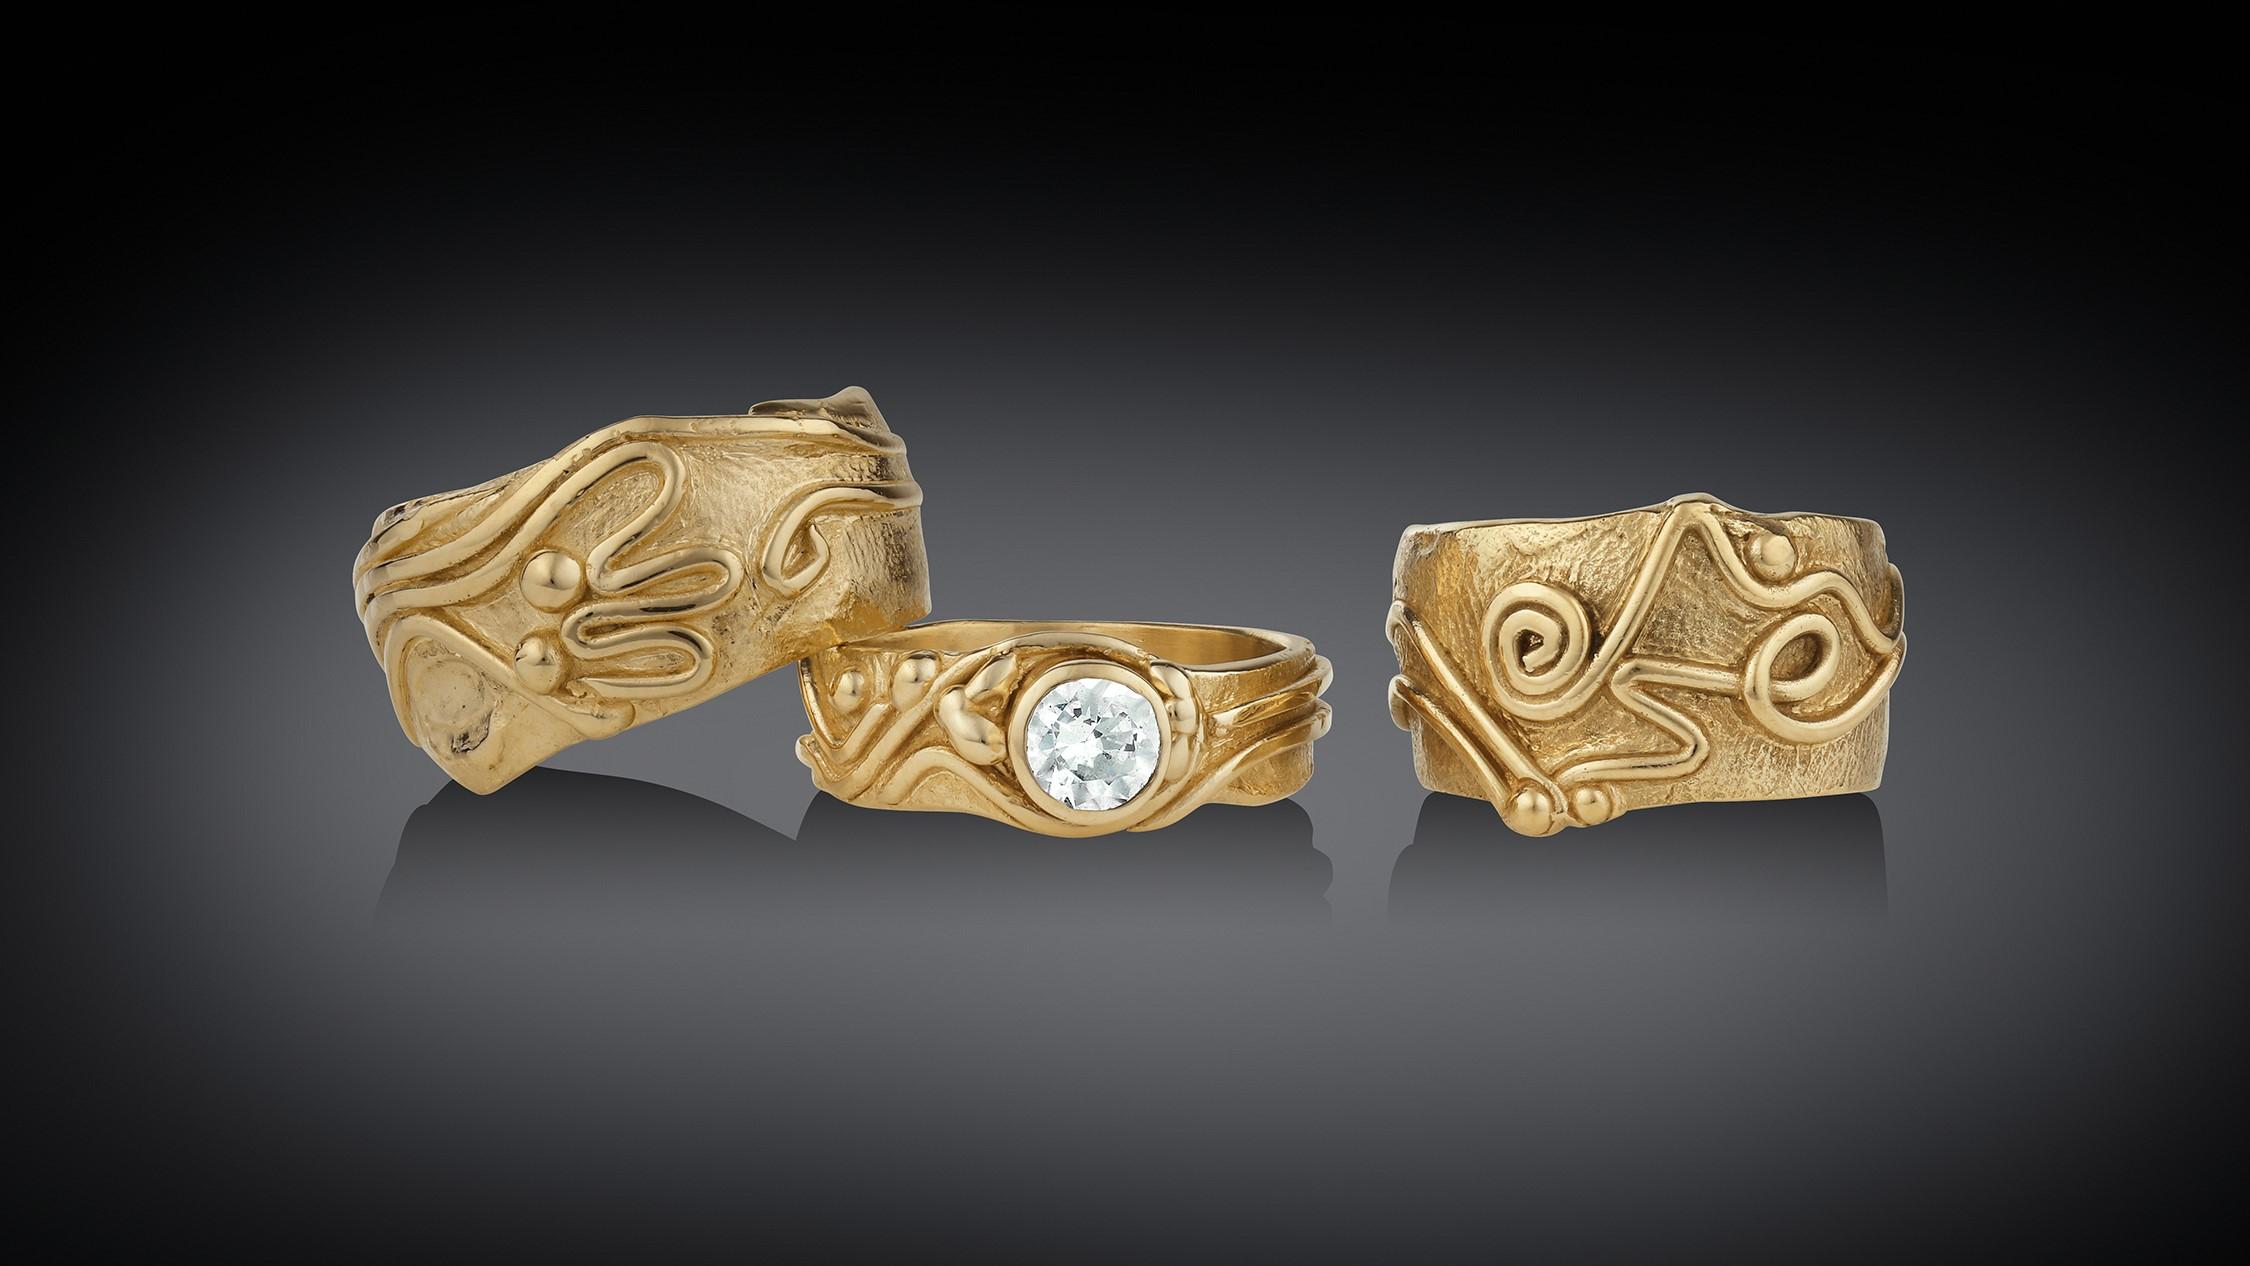 14K & 18K Gold Freestyle Ring Set by Geralyn Sheridan Designs